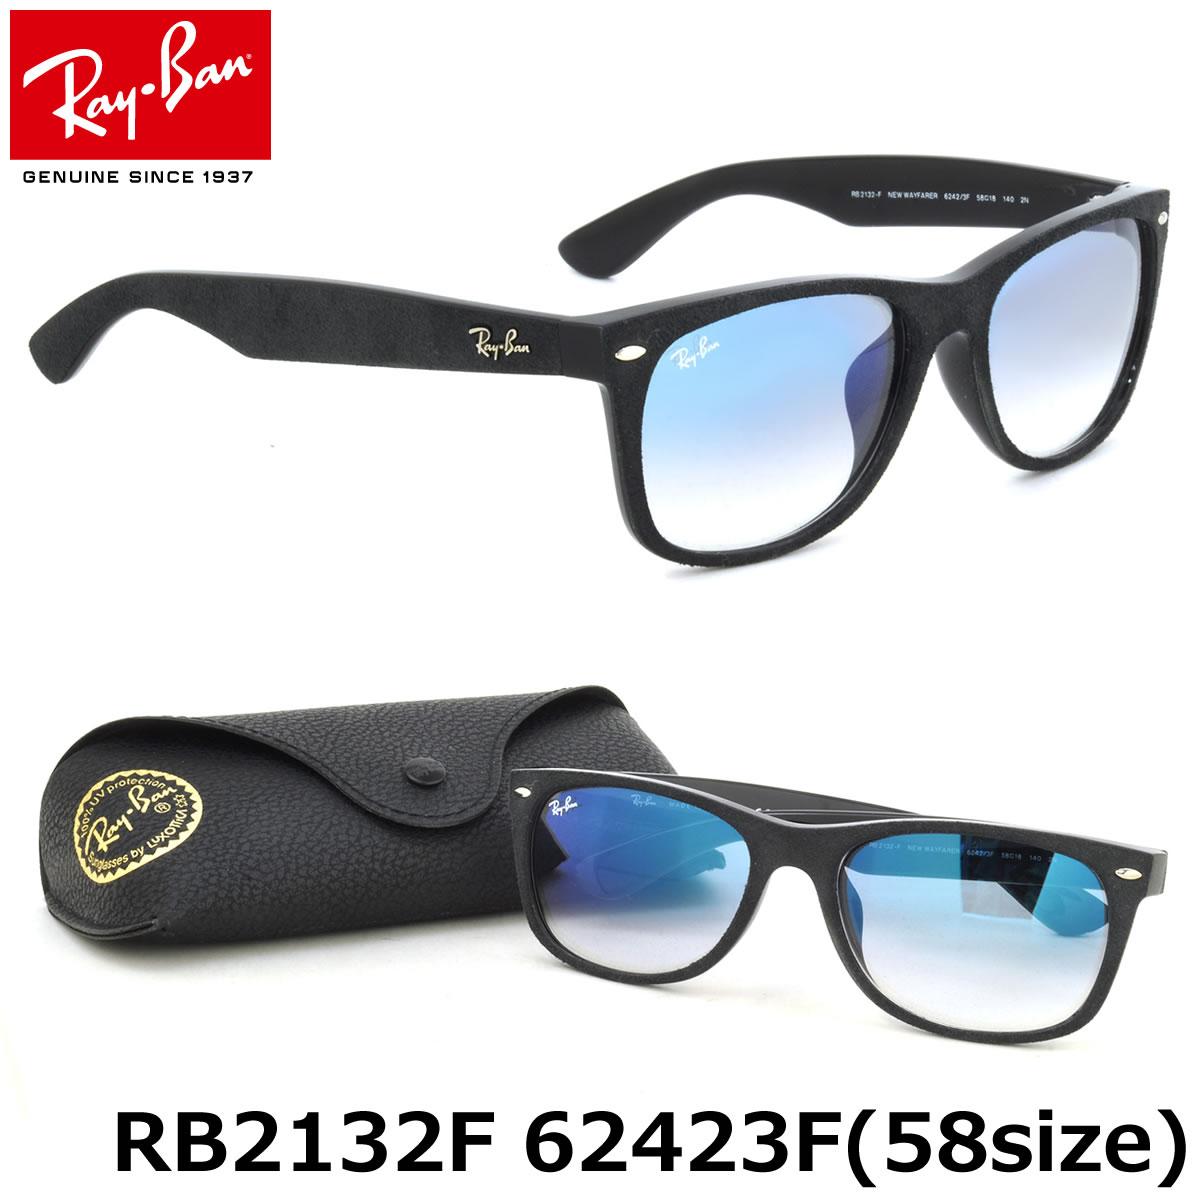 ray ban rb2132-f